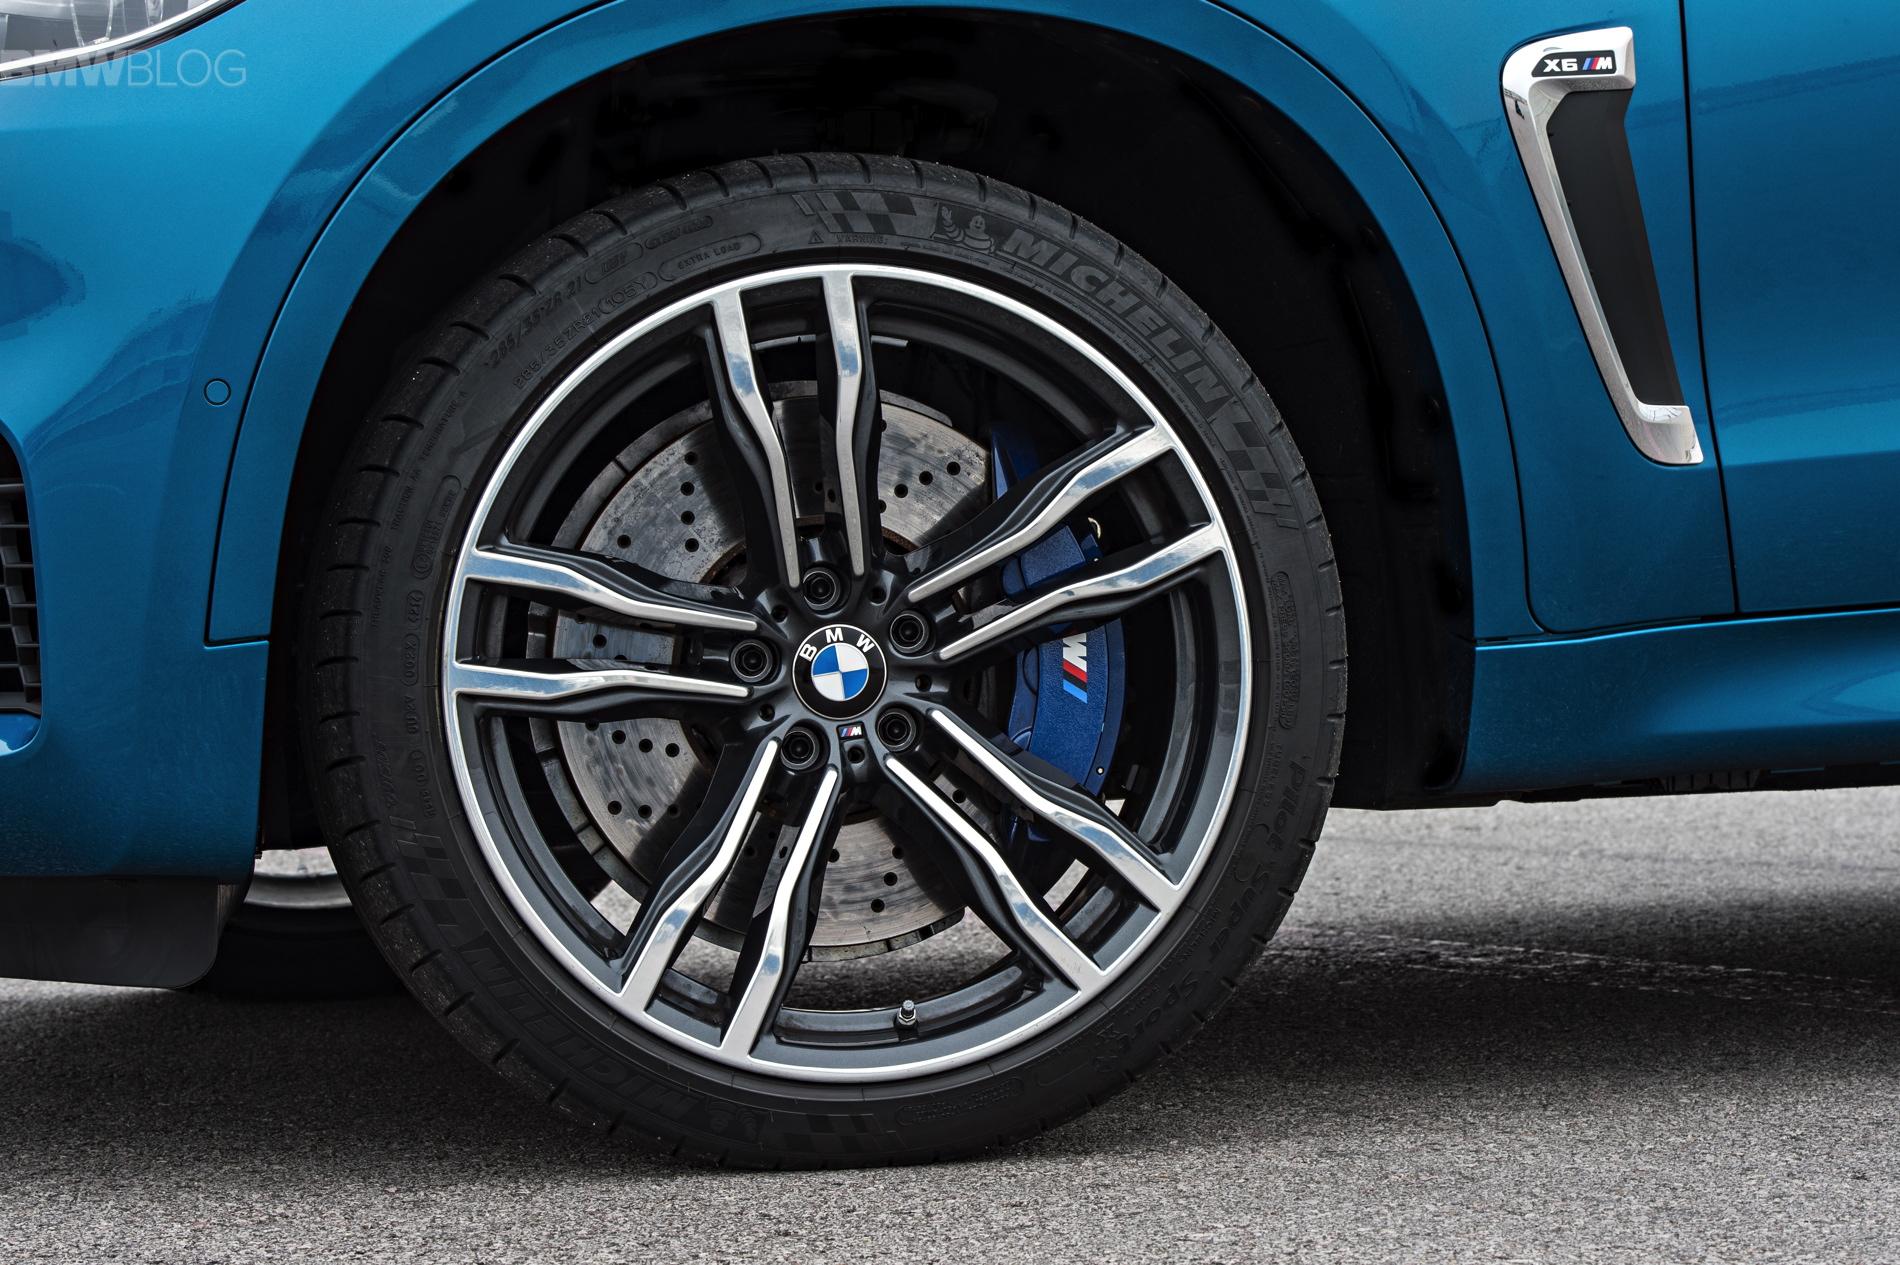 Michelin Pilot Super Sport Review >> Michelin Pilot Super Sport designed specifically for the new BMW X6M